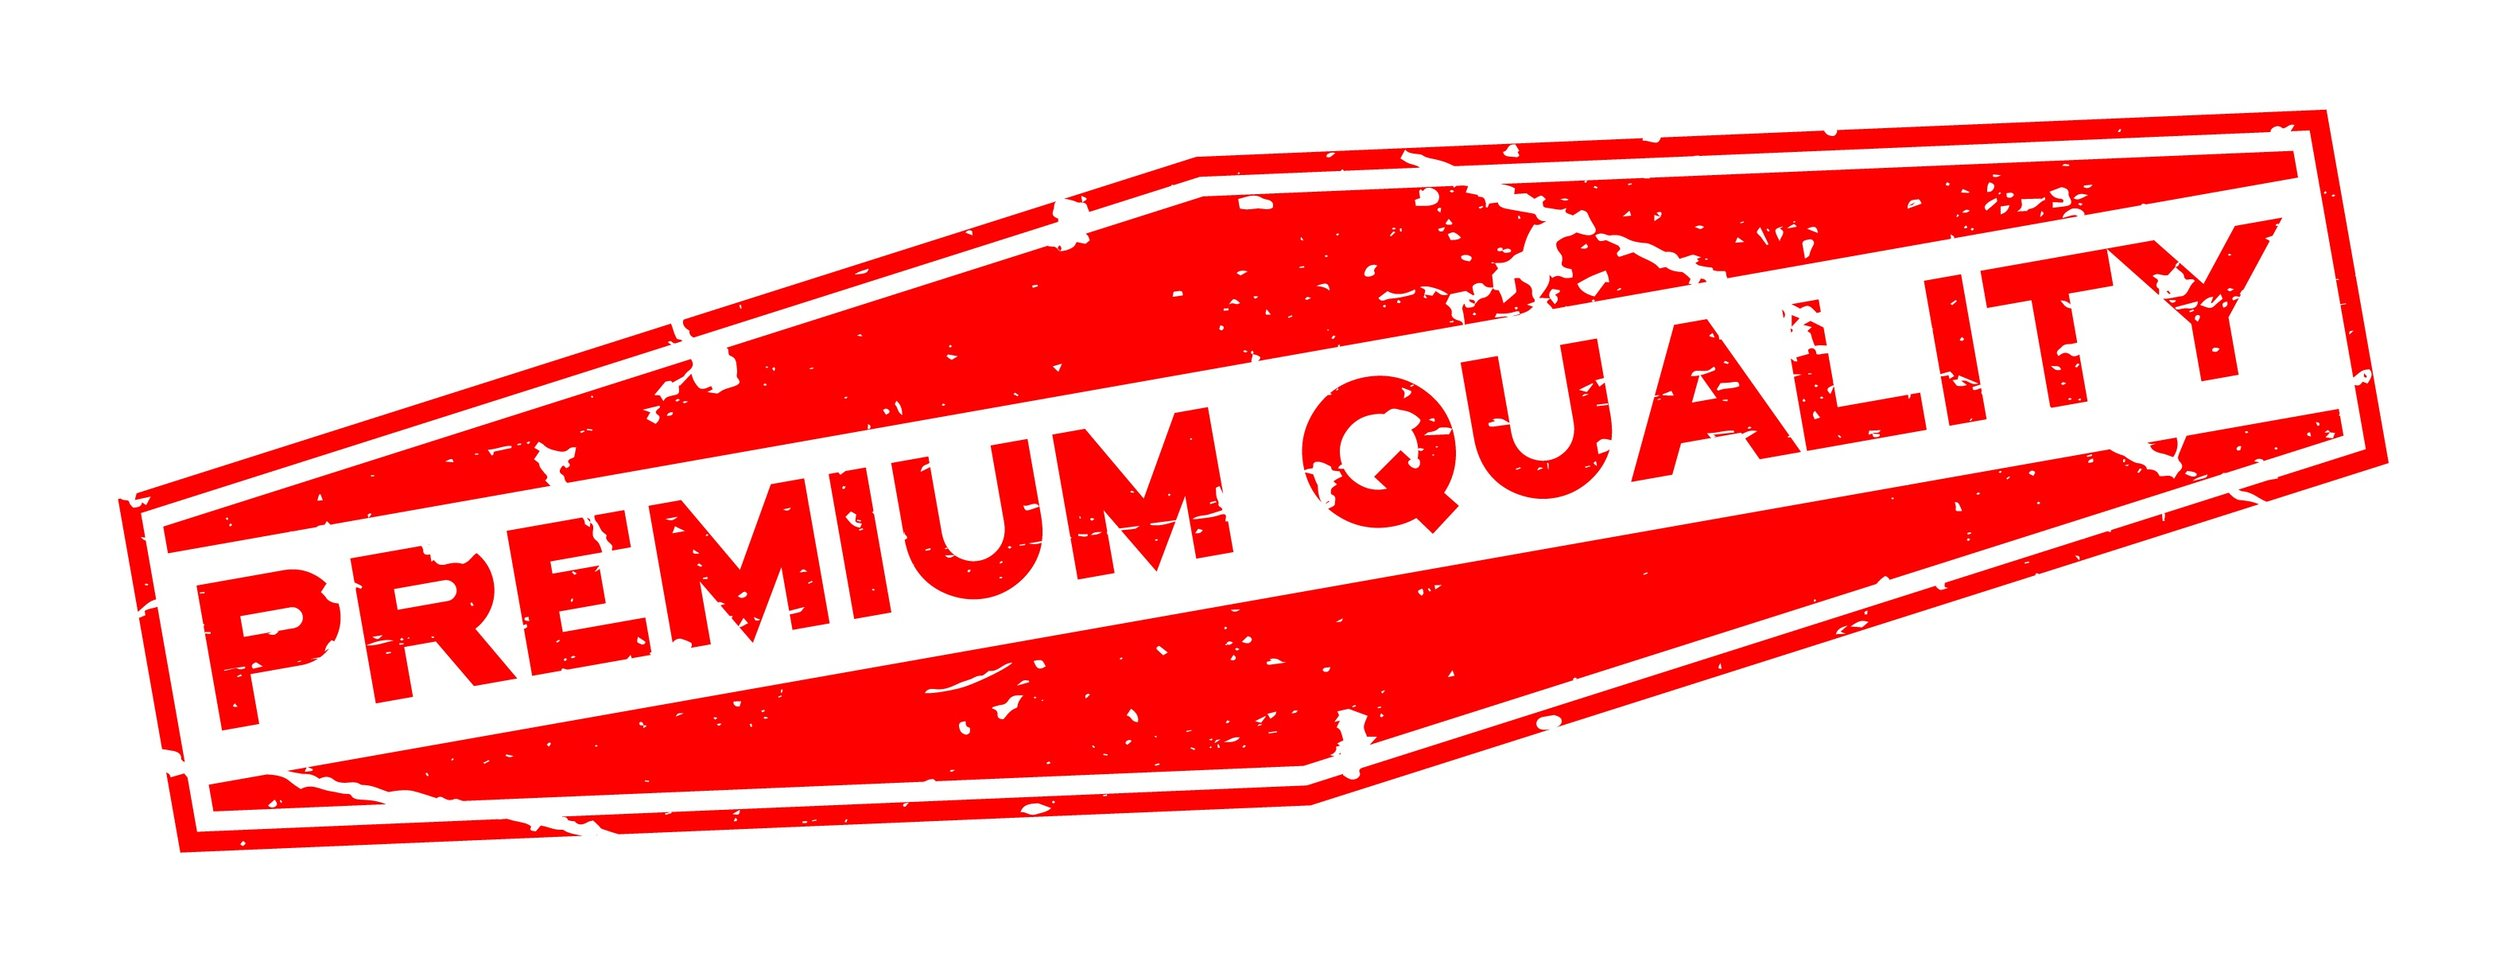 Premium Quality Large.jpg